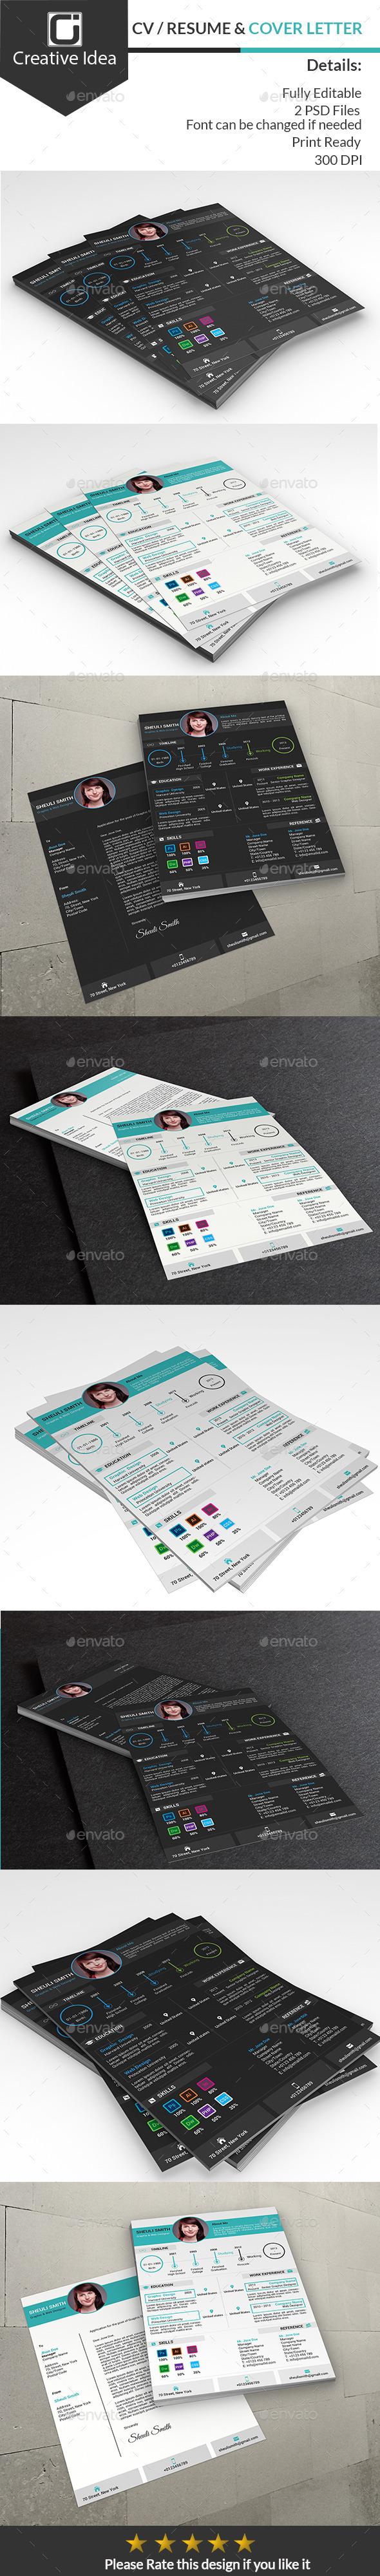 GraphicRiver CV Resume & Cover Letter 10300332